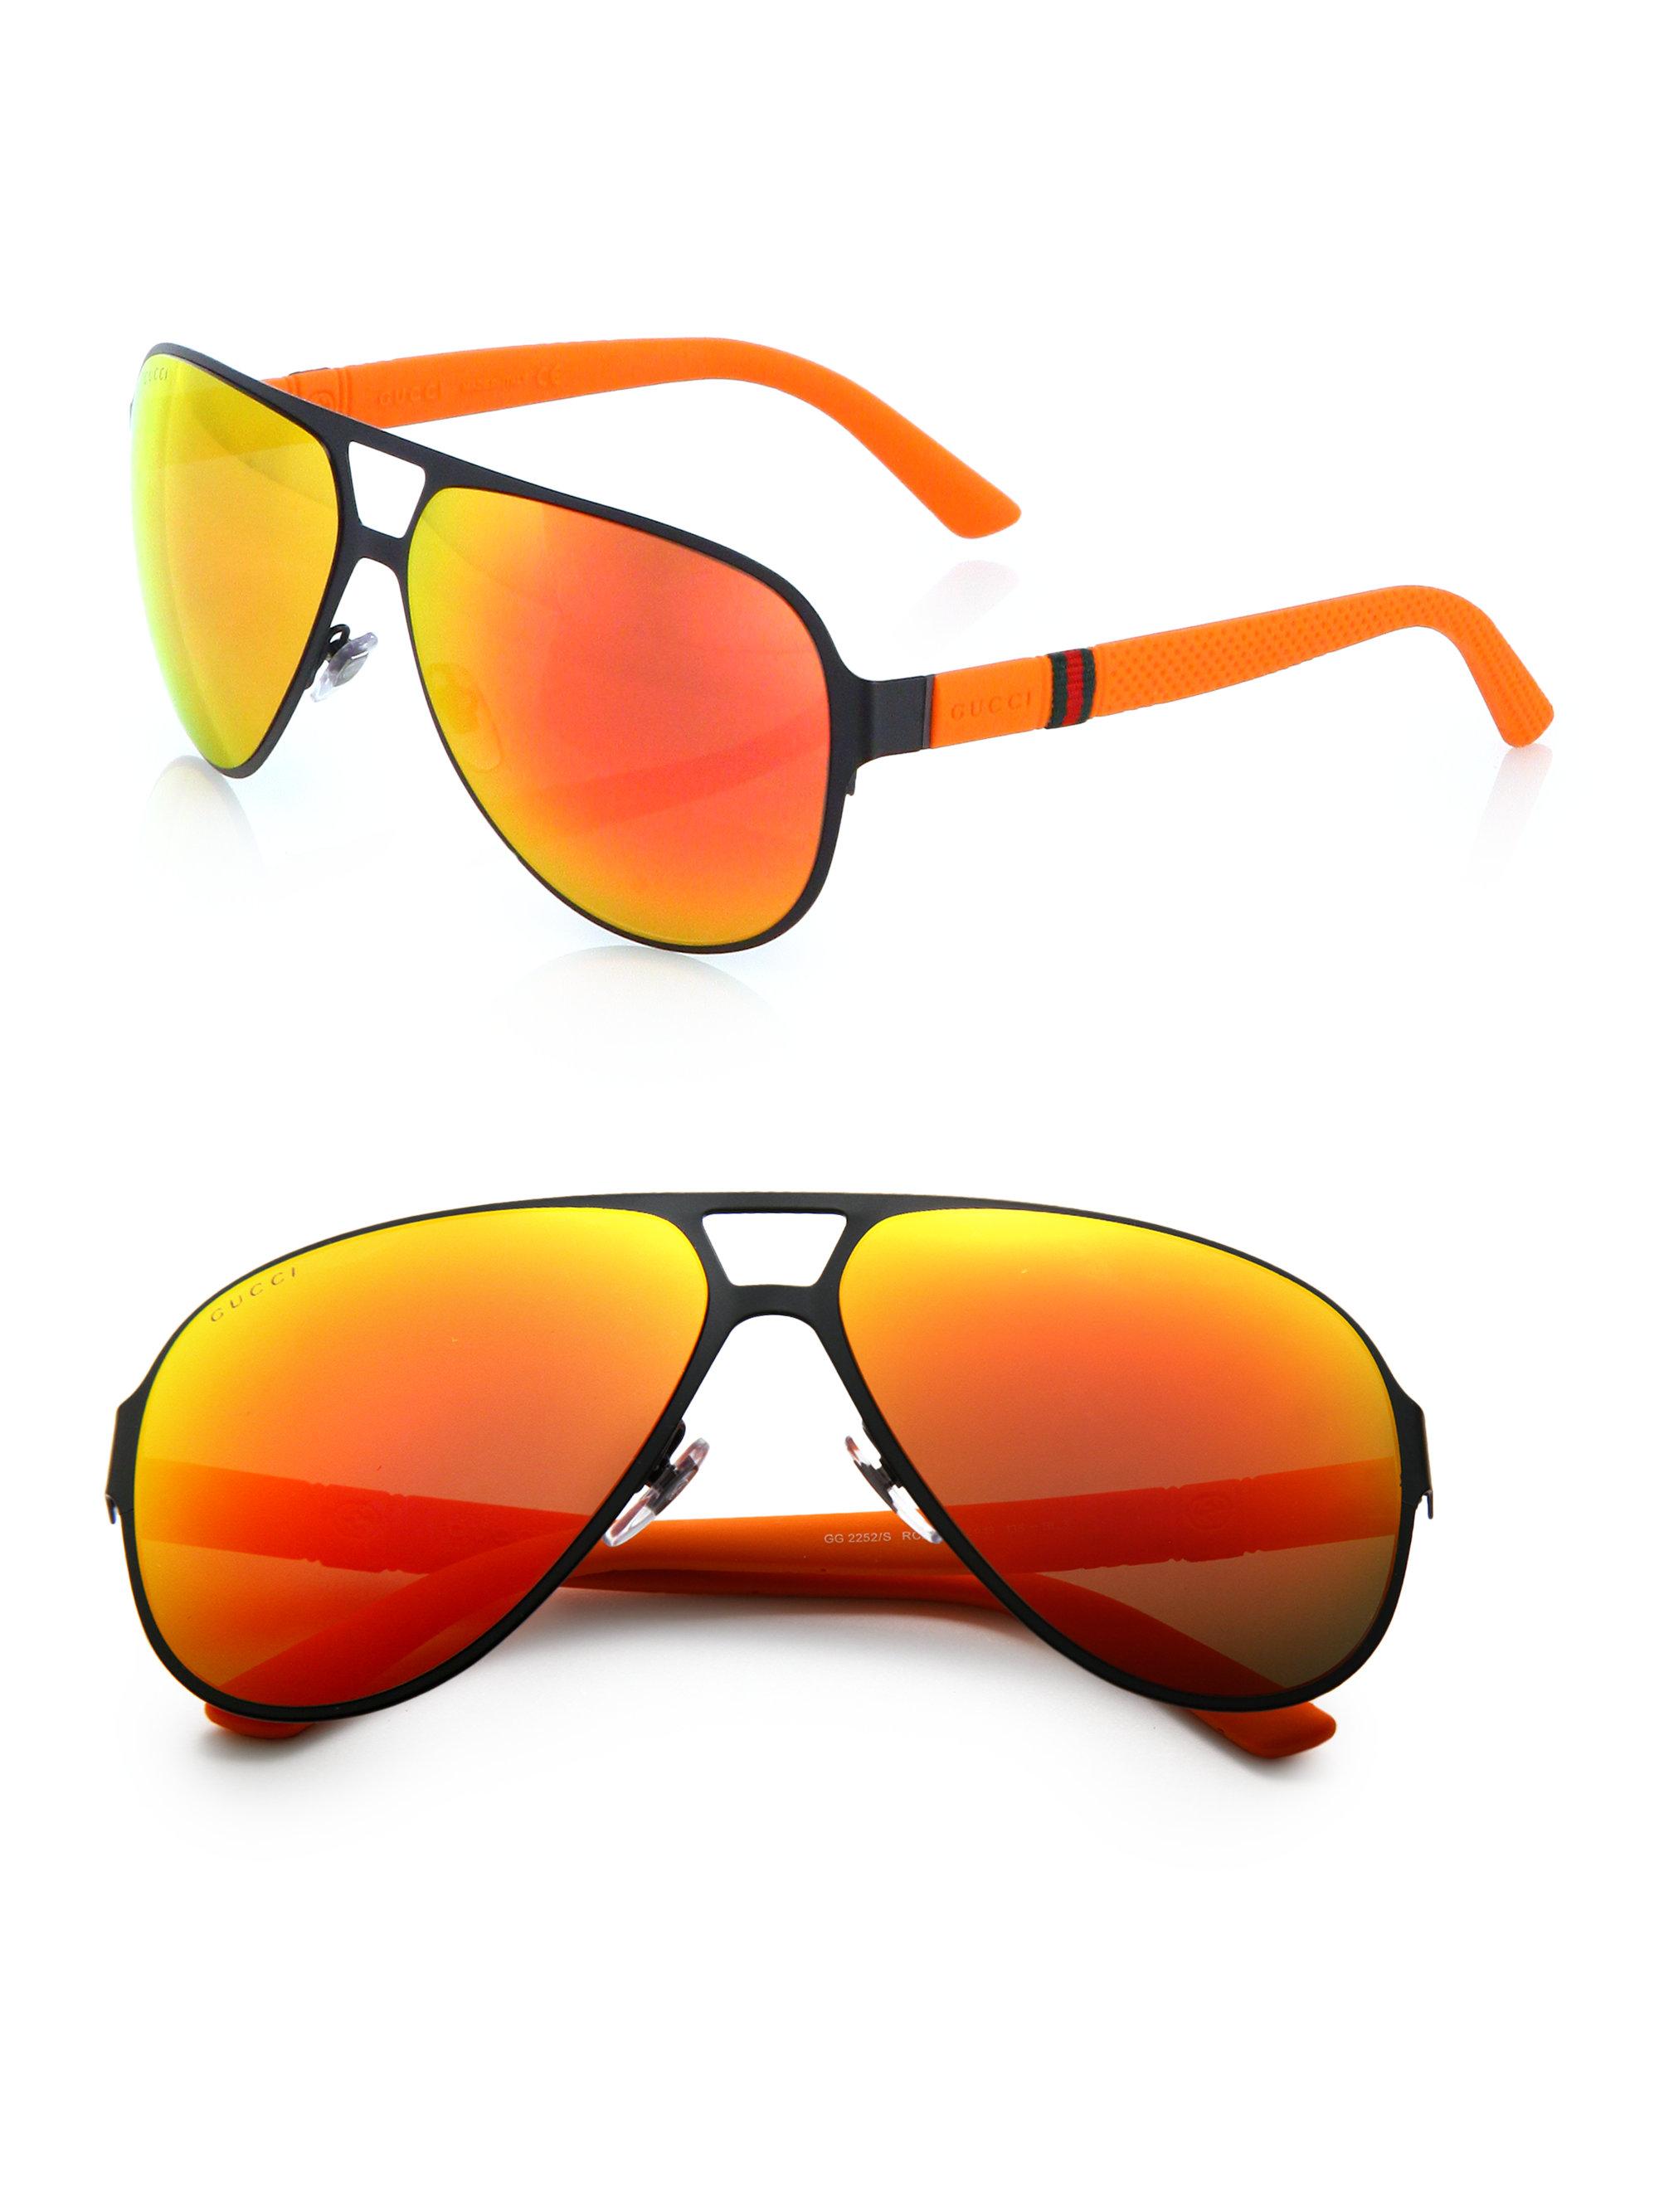 75753a5e0d Gucci Aviator Sunglasses Yellow Leopard - Restaurant and Palinka Bar